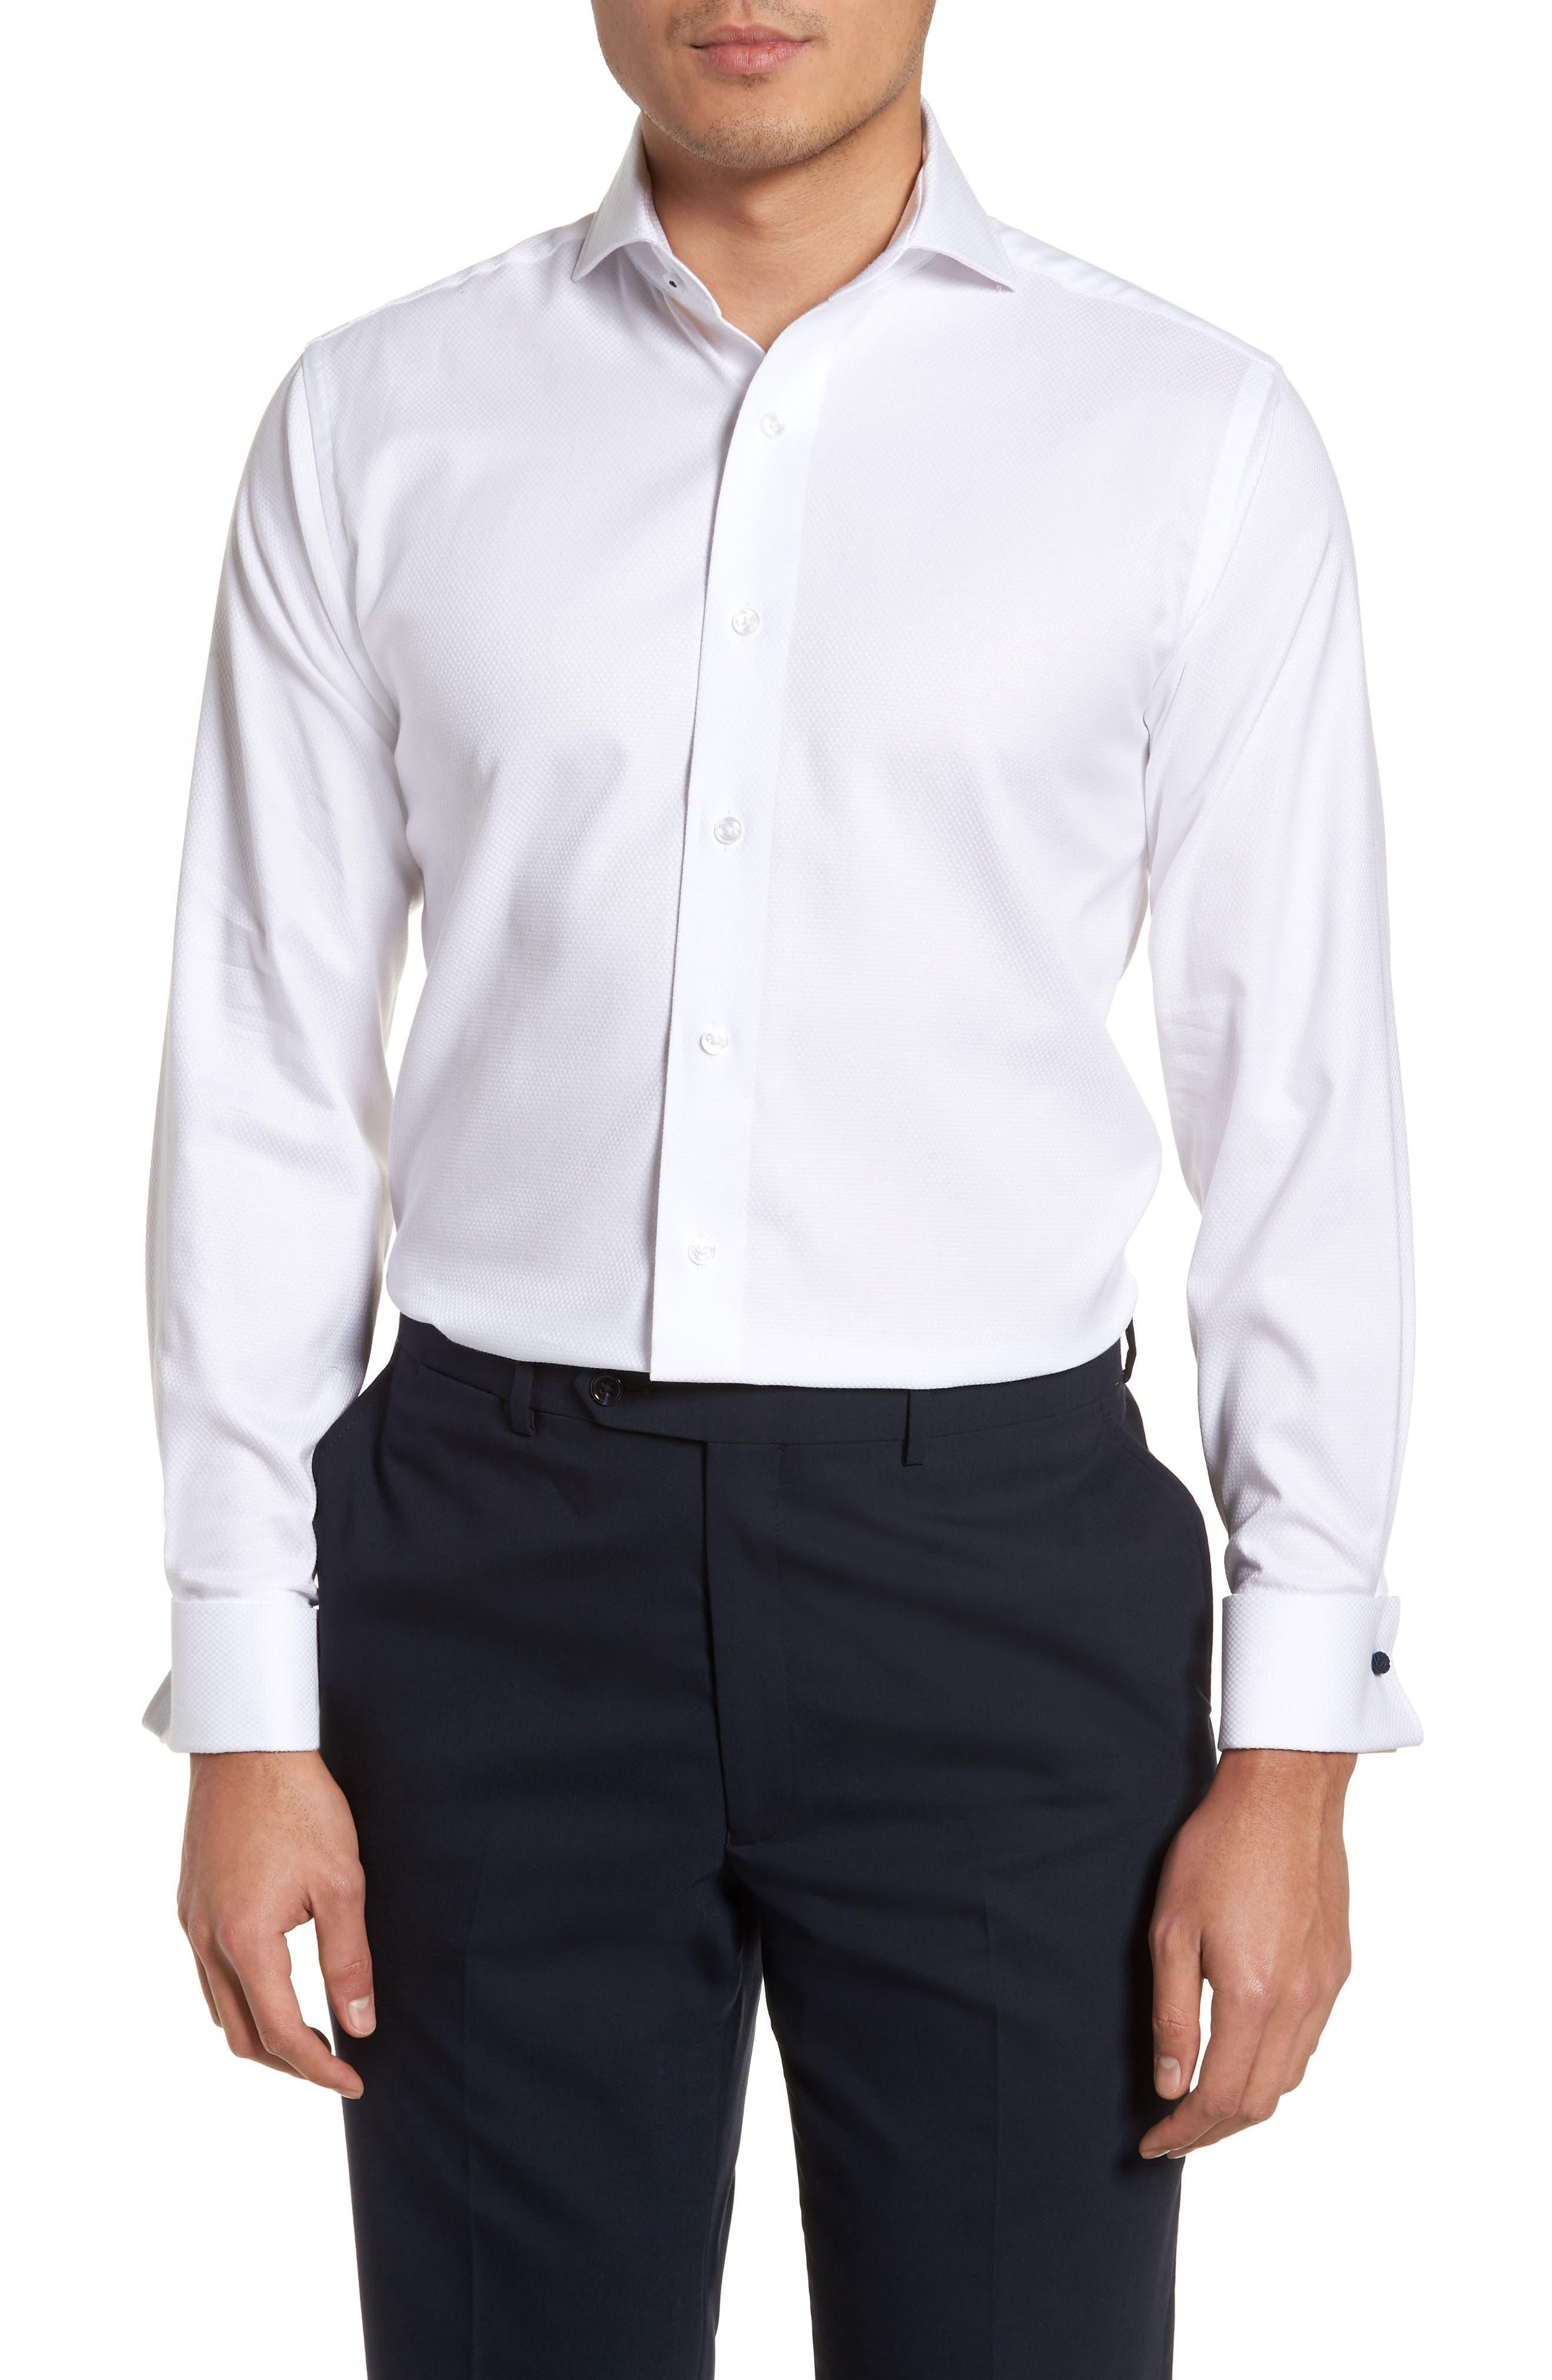 LORENZO UOMO, Trim Fit Basket Weave Dress Shirt, Main thumbnail 1, color, WHITE